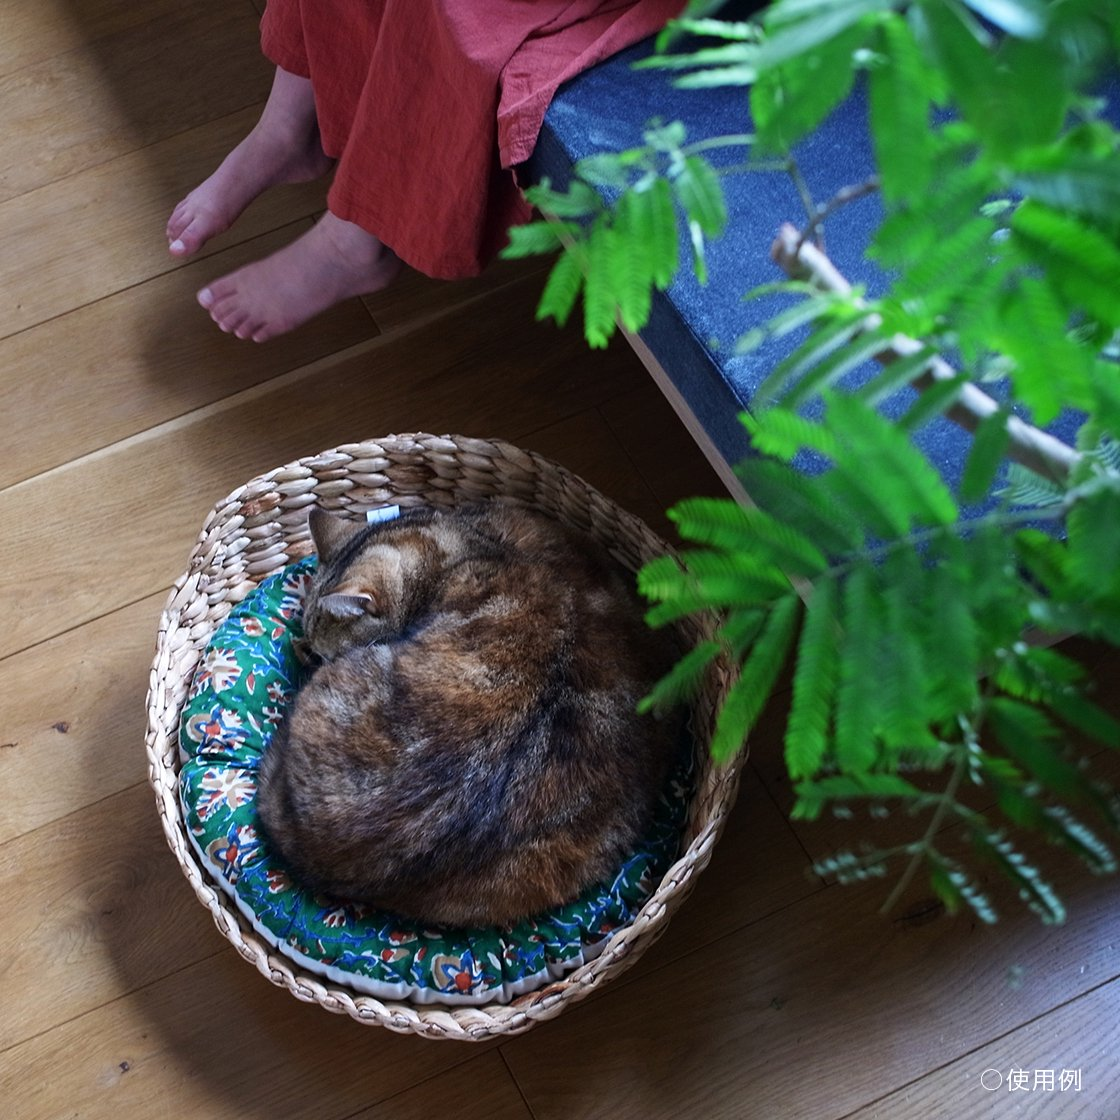 <img class='new_mark_img1' src='https://img.shop-pro.jp/img/new/icons57.gif' style='border:none;display:inline;margin:0px;padding:0px;width:auto;' />OZABUクッション-Lサイズ【ハンドブロック/グリーン系 #2】 /For Cat